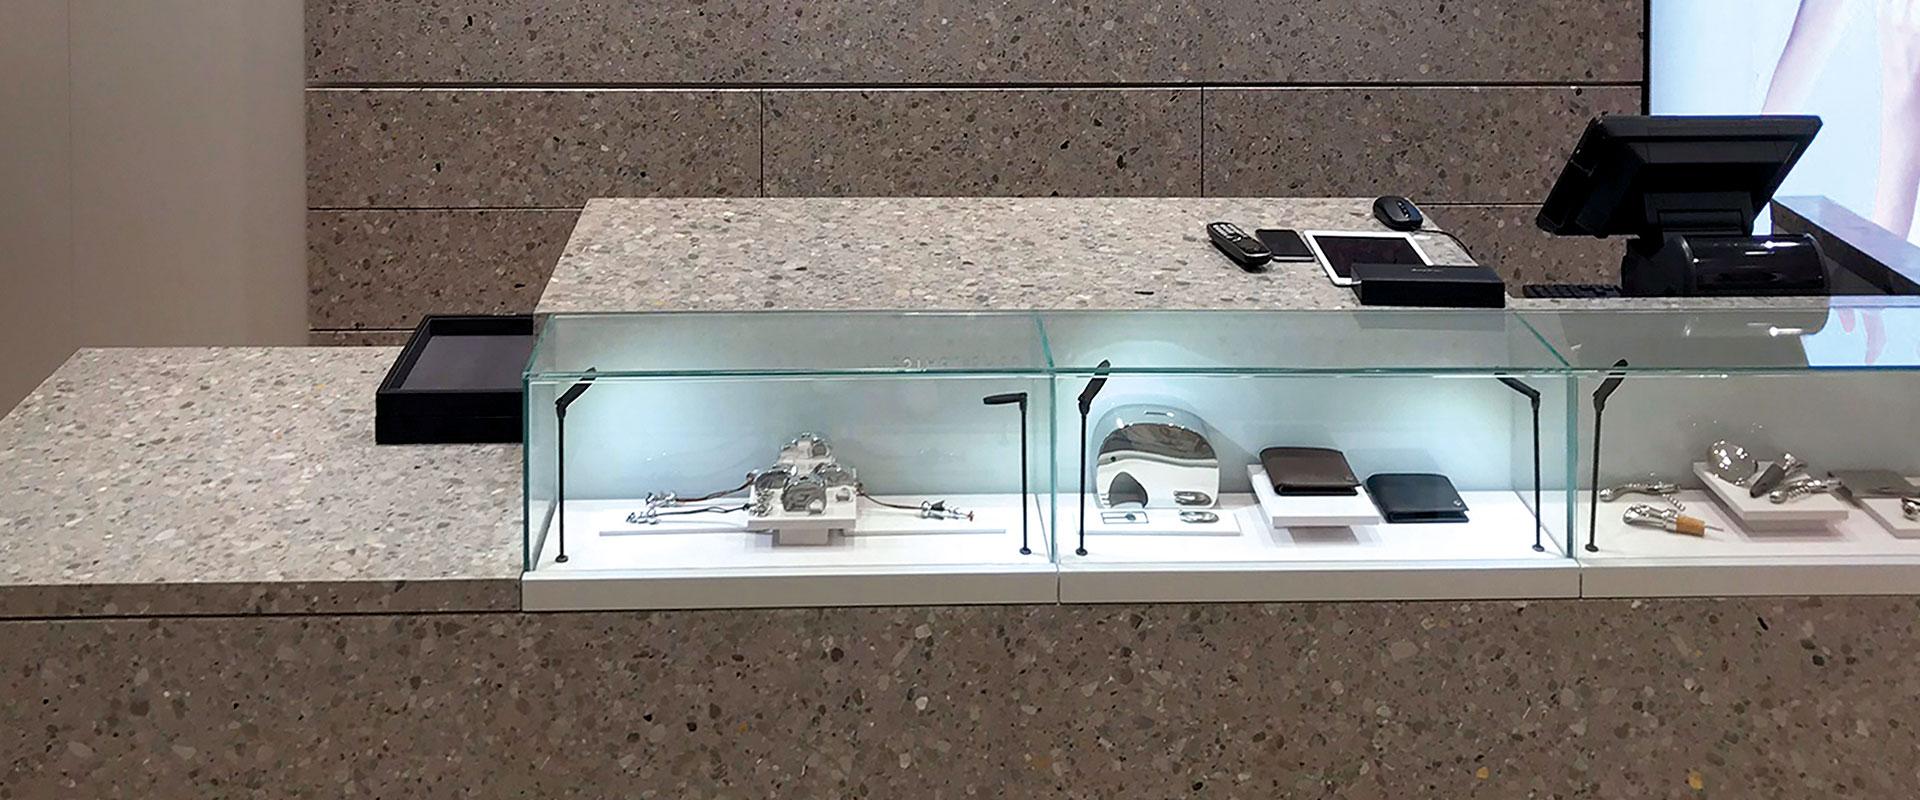 AGGLOTECH-progetto-George-Jensen-Dubai-slider-2